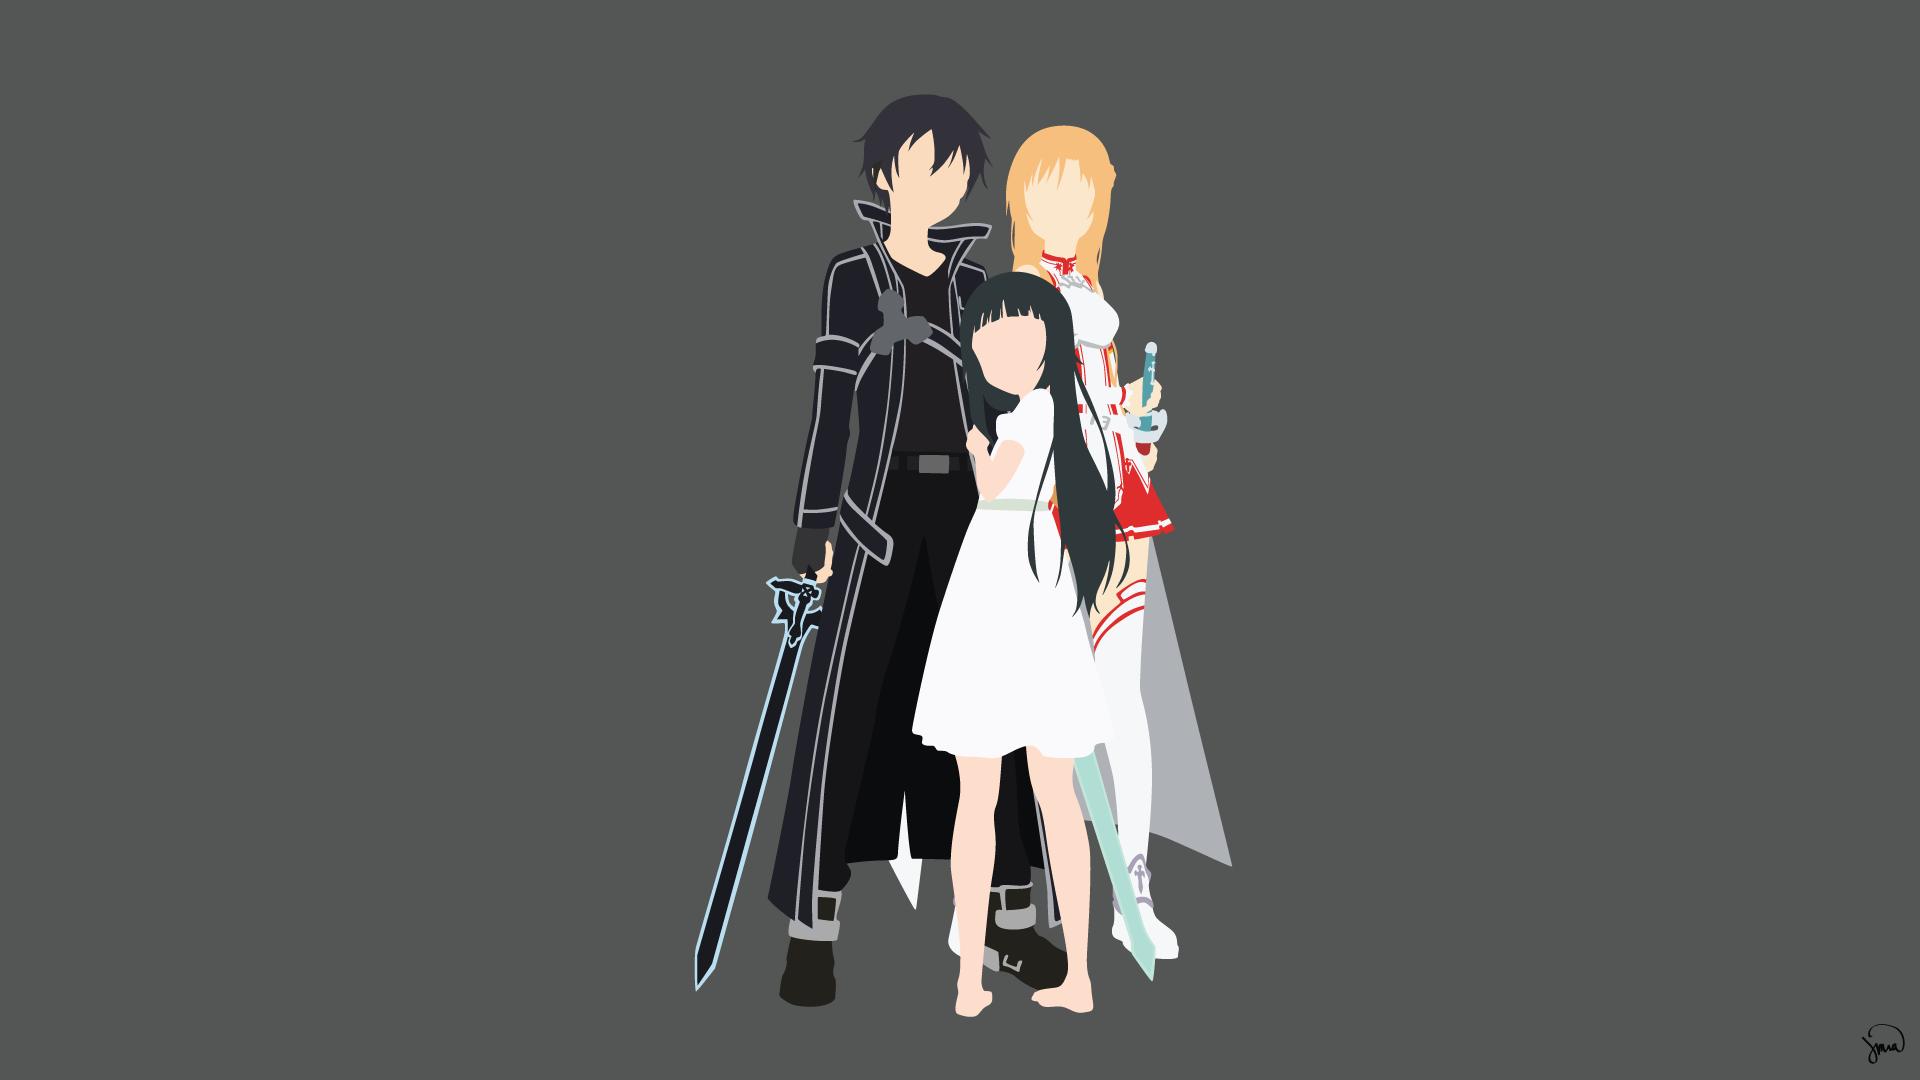 Kirito, Asuna and Yui HD Wallpaper | Background Image ... Sword Art Online Wallpaper 1920x1080 Yui